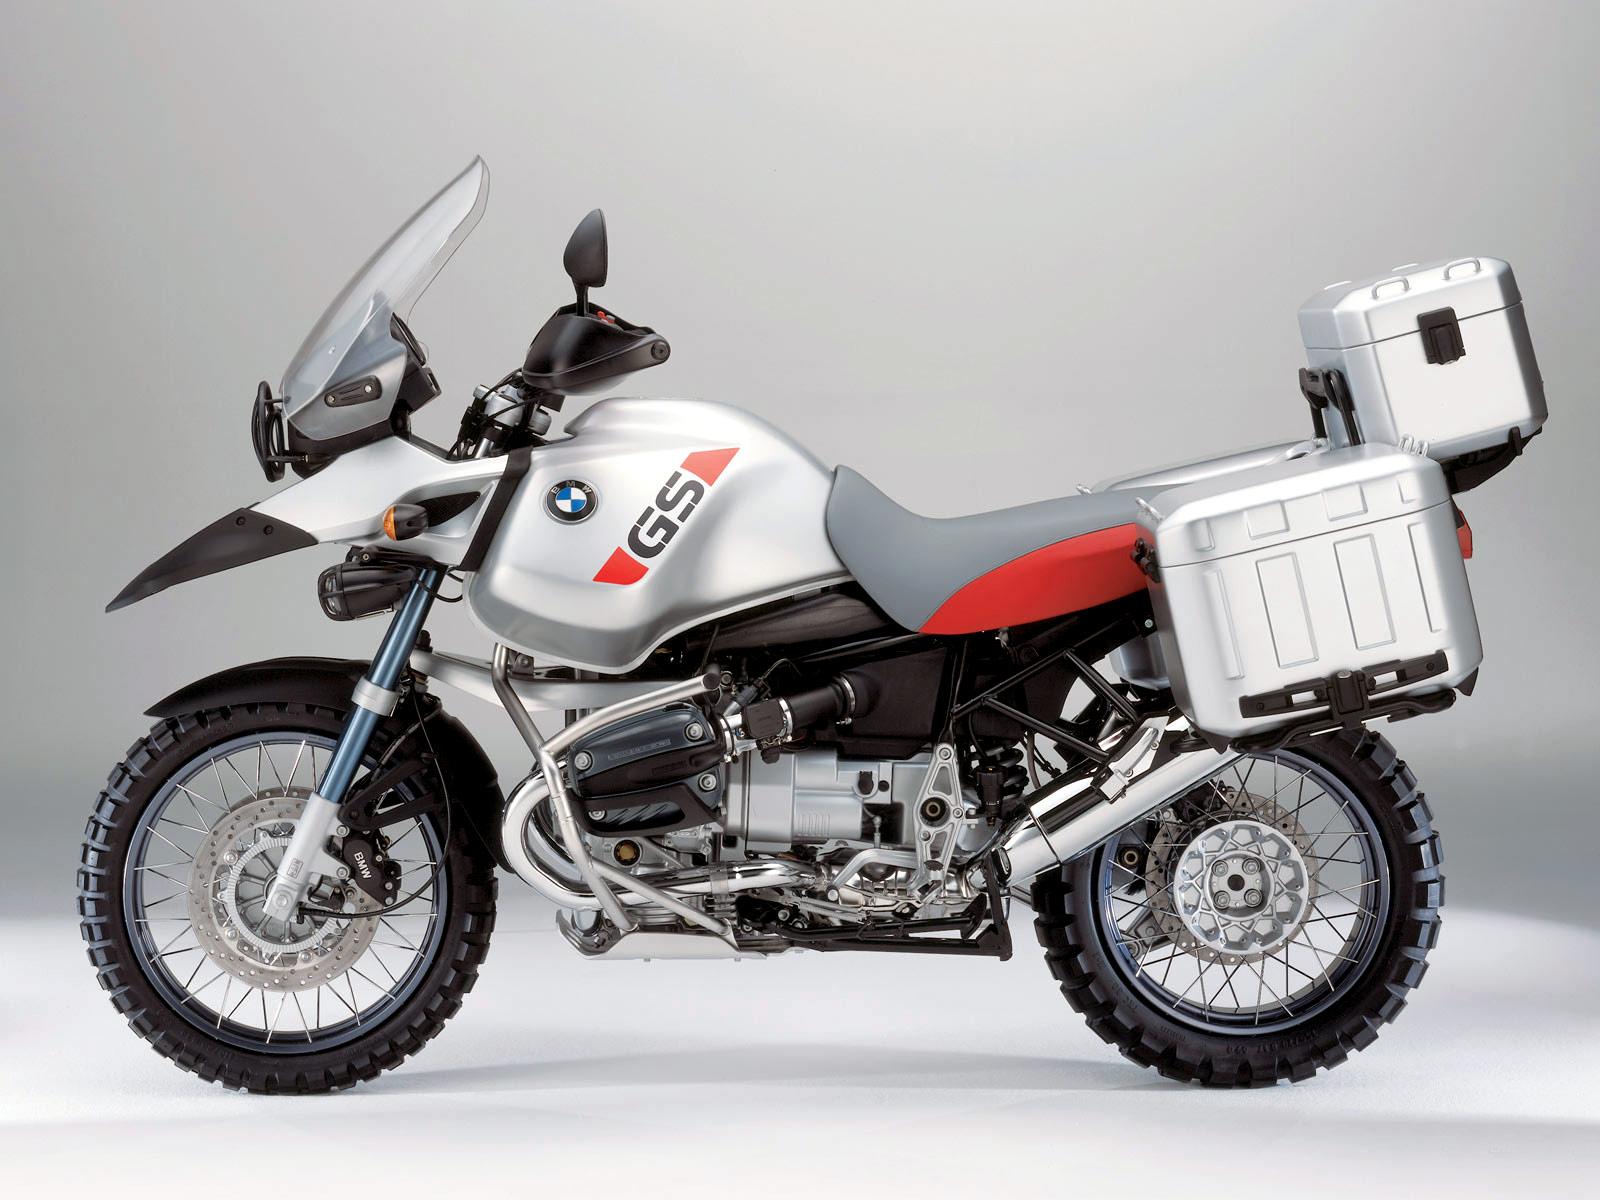 2001 bmw r1150 gs adventure motorcycle bmw automotive. Black Bedroom Furniture Sets. Home Design Ideas